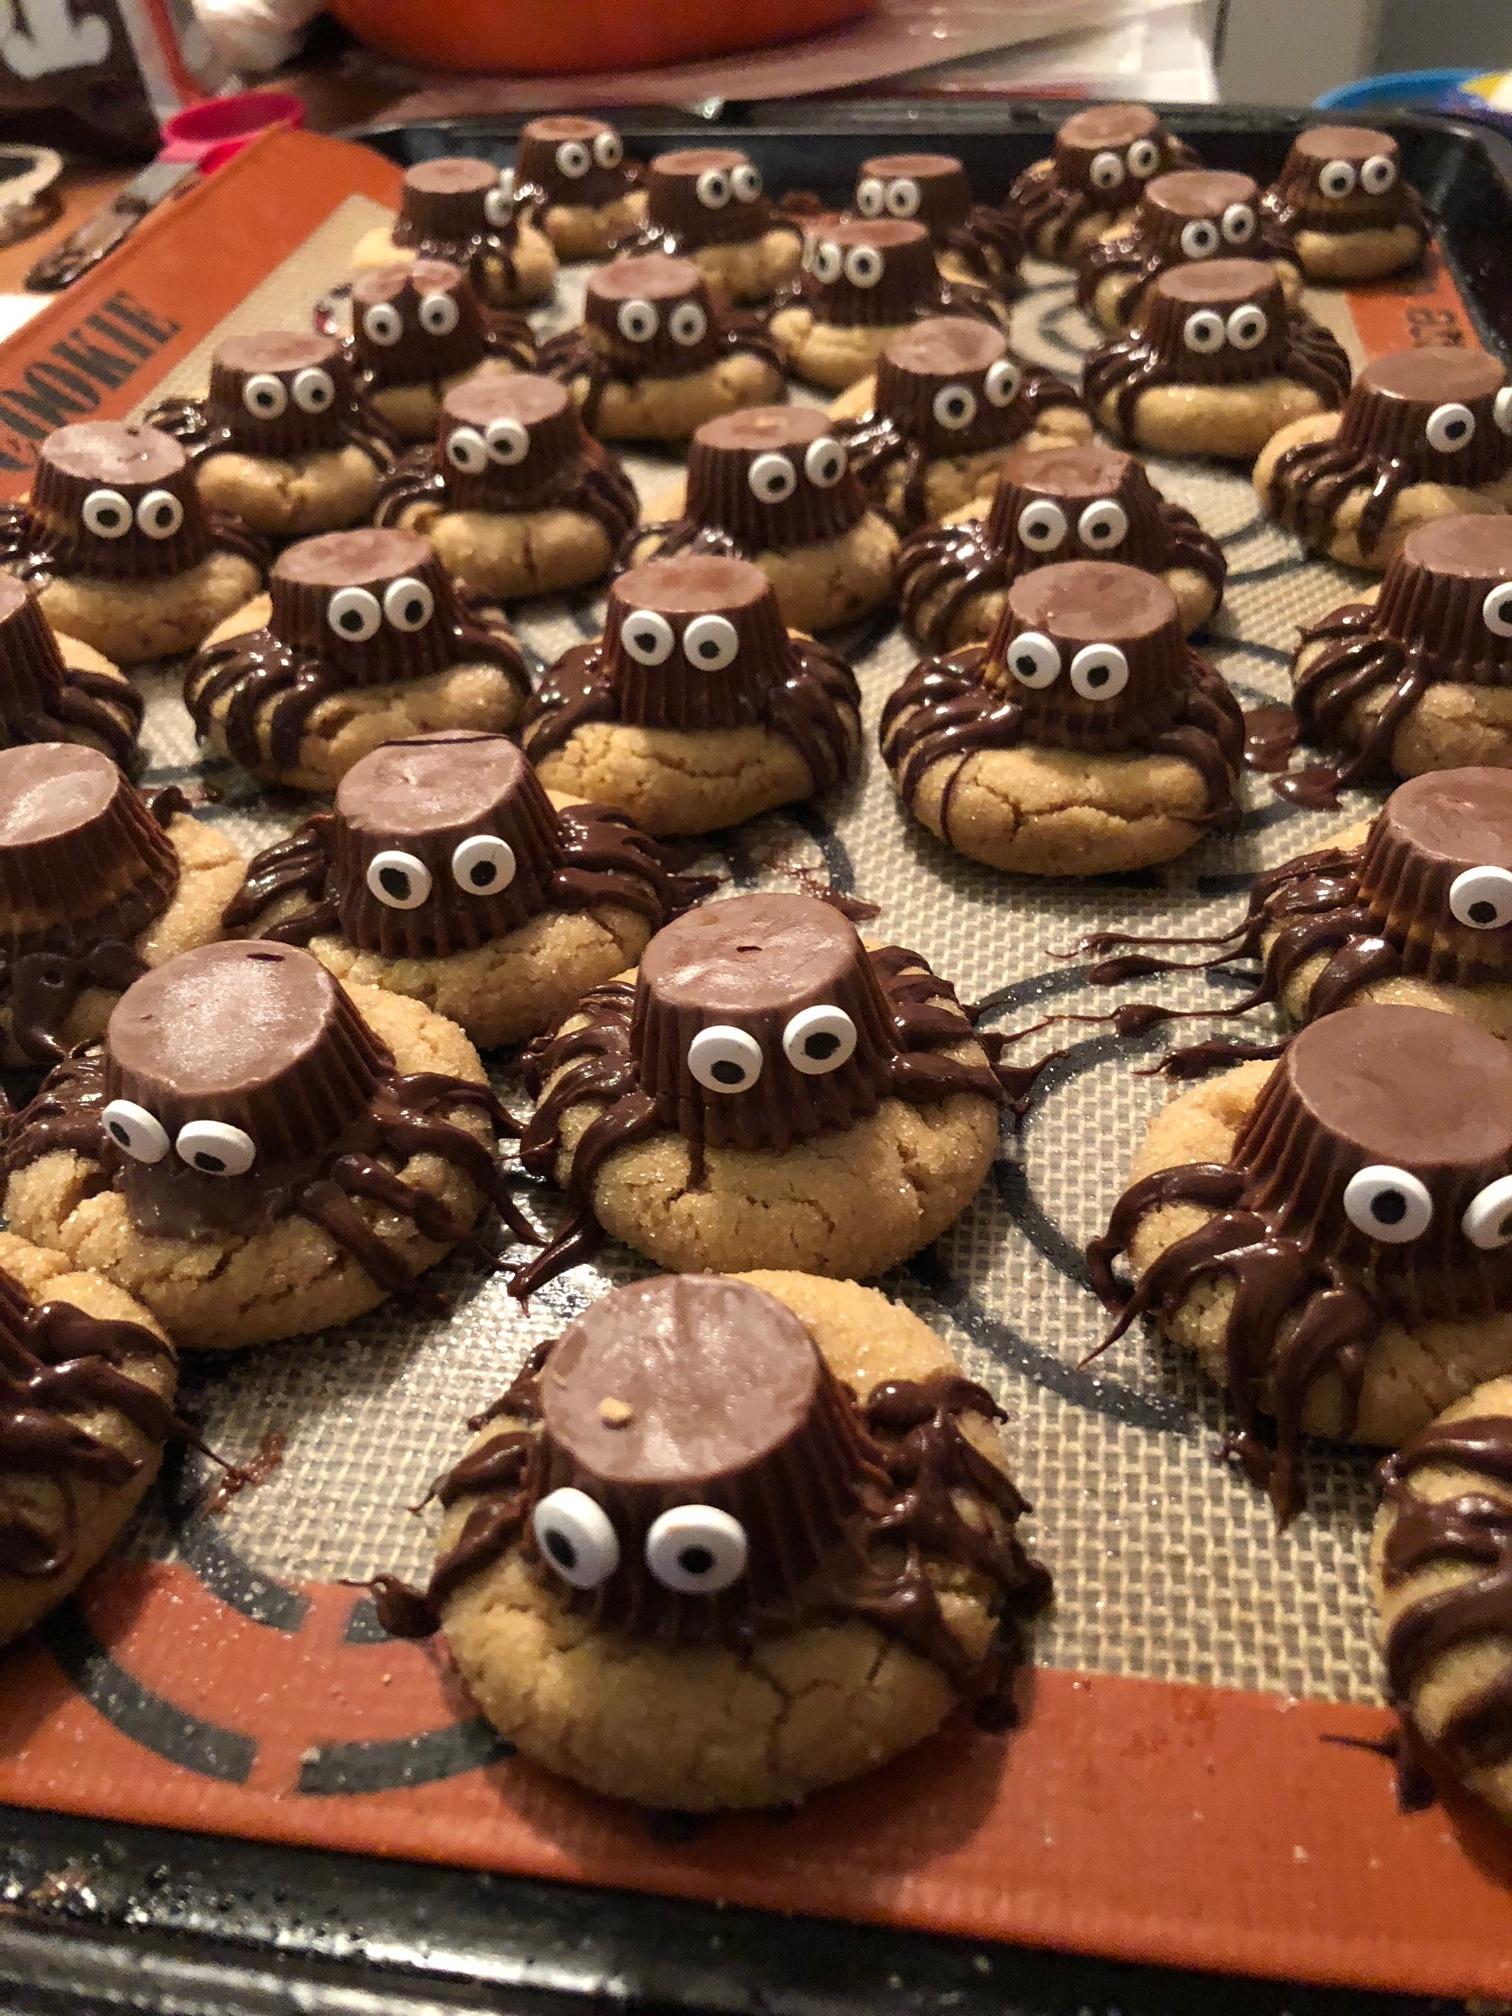 spider cookies photos.JPG